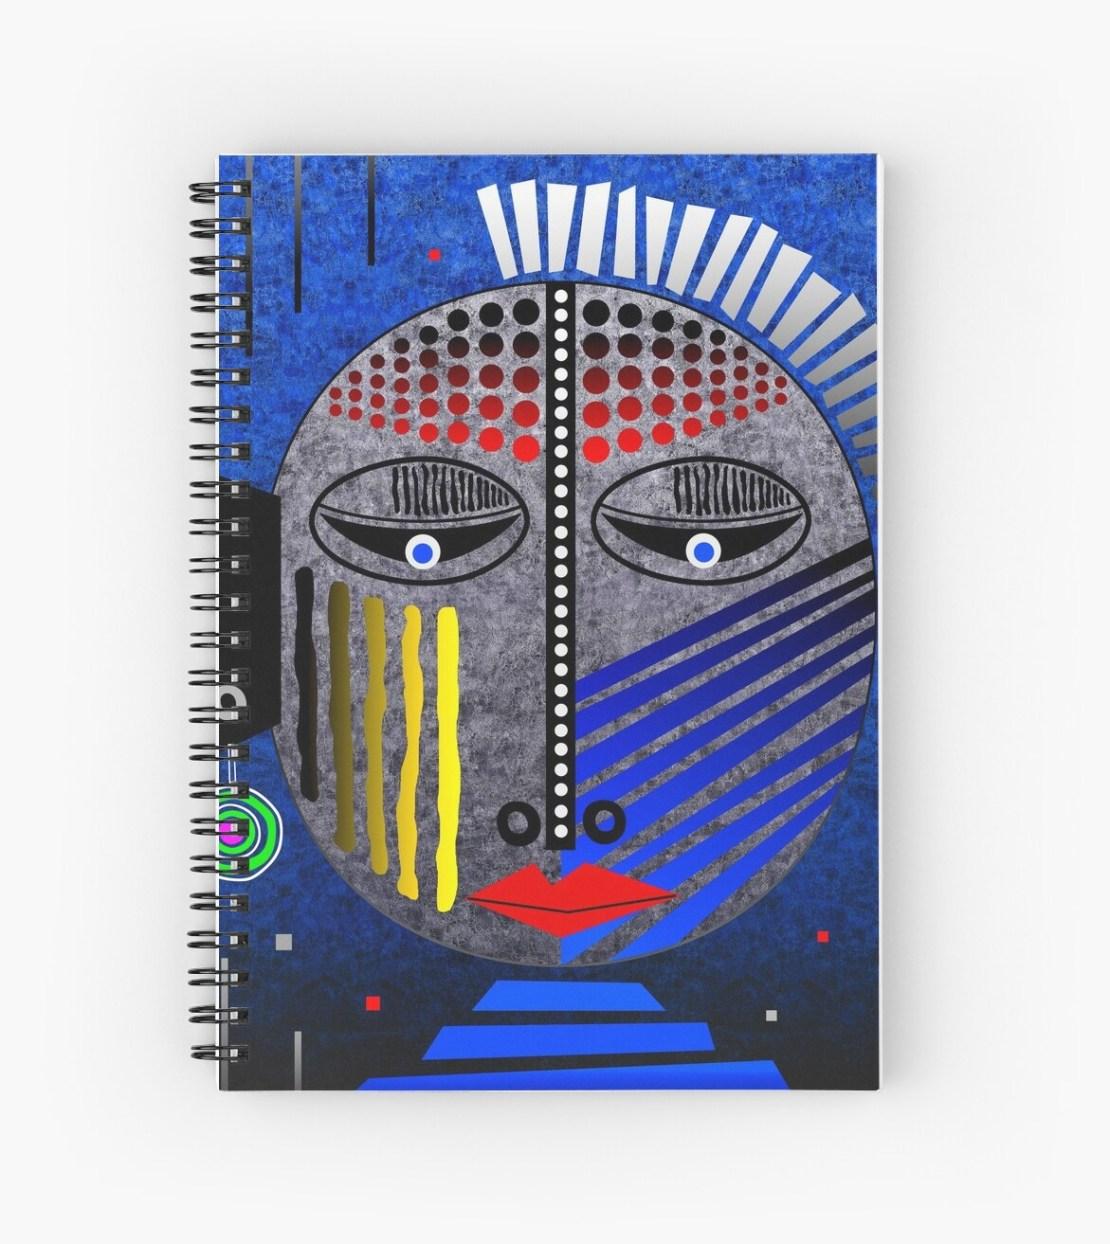 'Tribal Whimsy 12' Spiral Notebook by Glen Allison